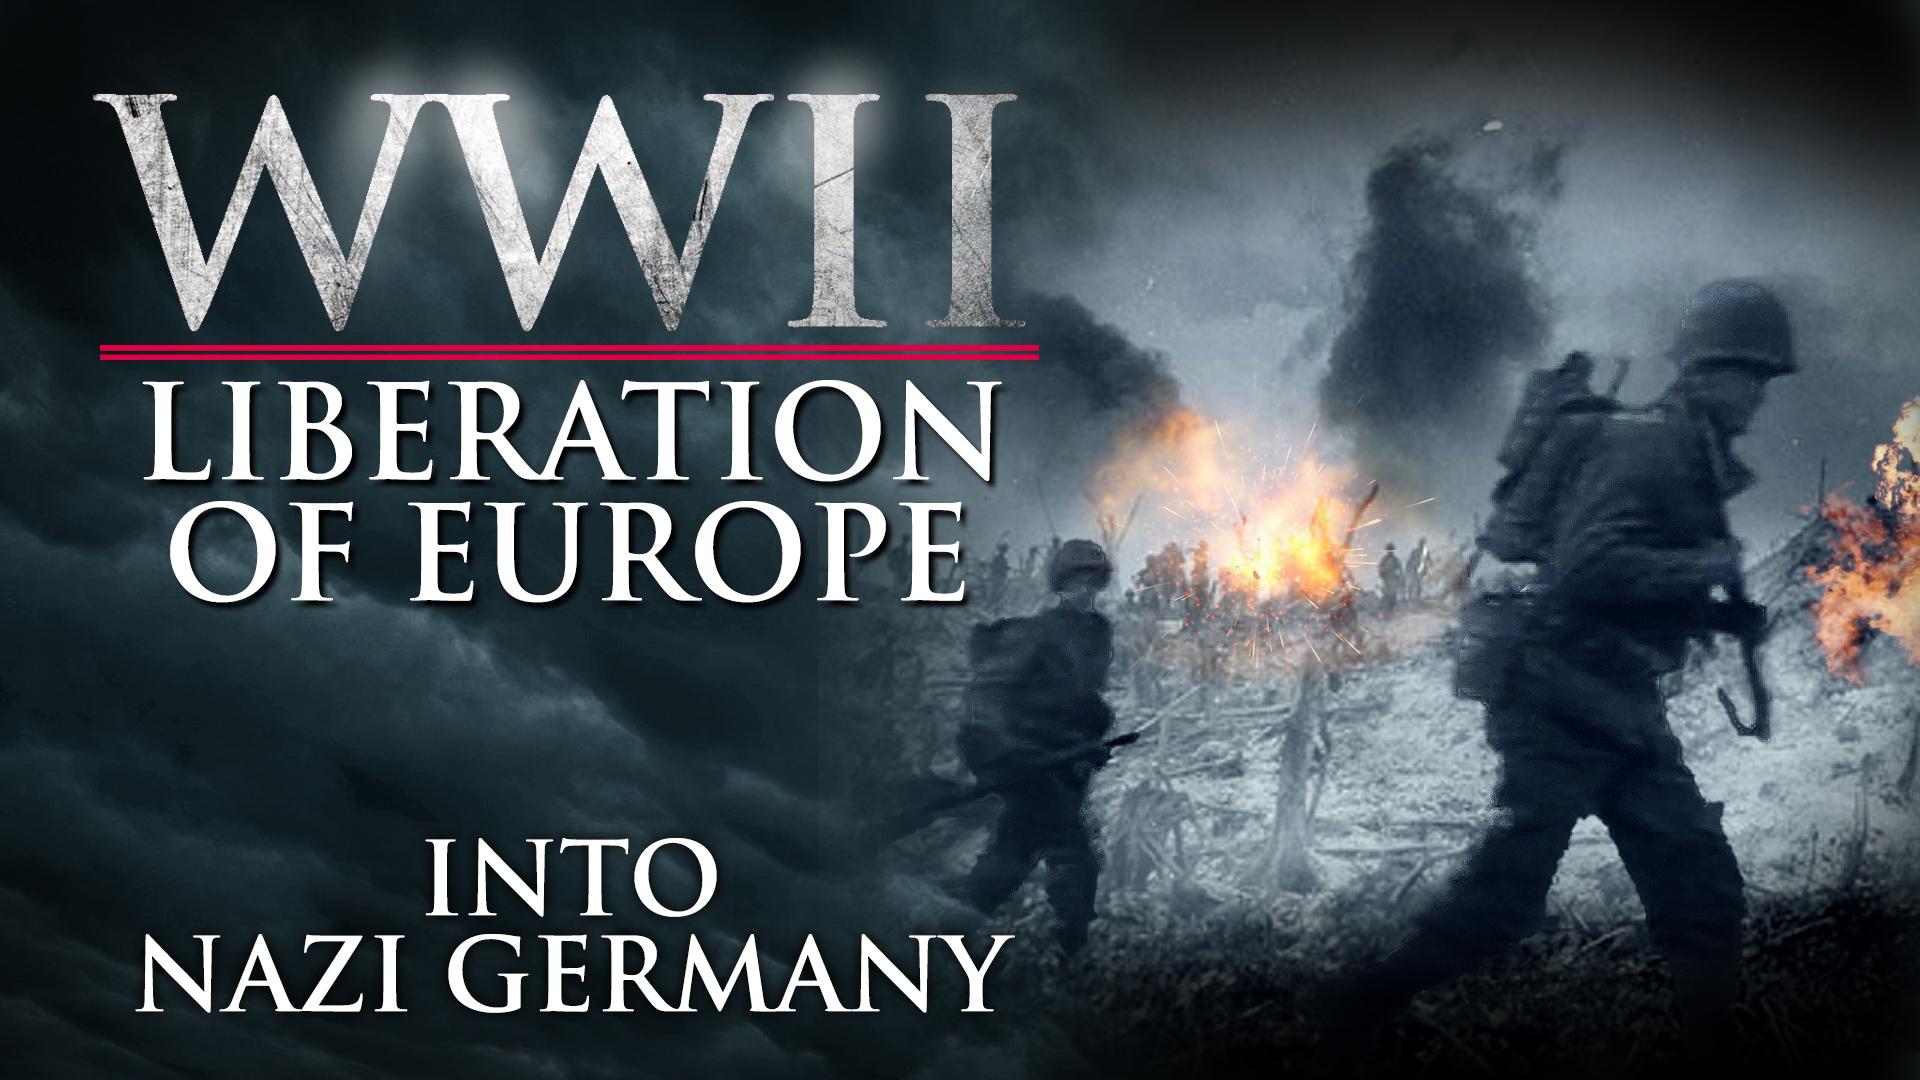 WWII Liberation of Europe - Into Nazi Germany